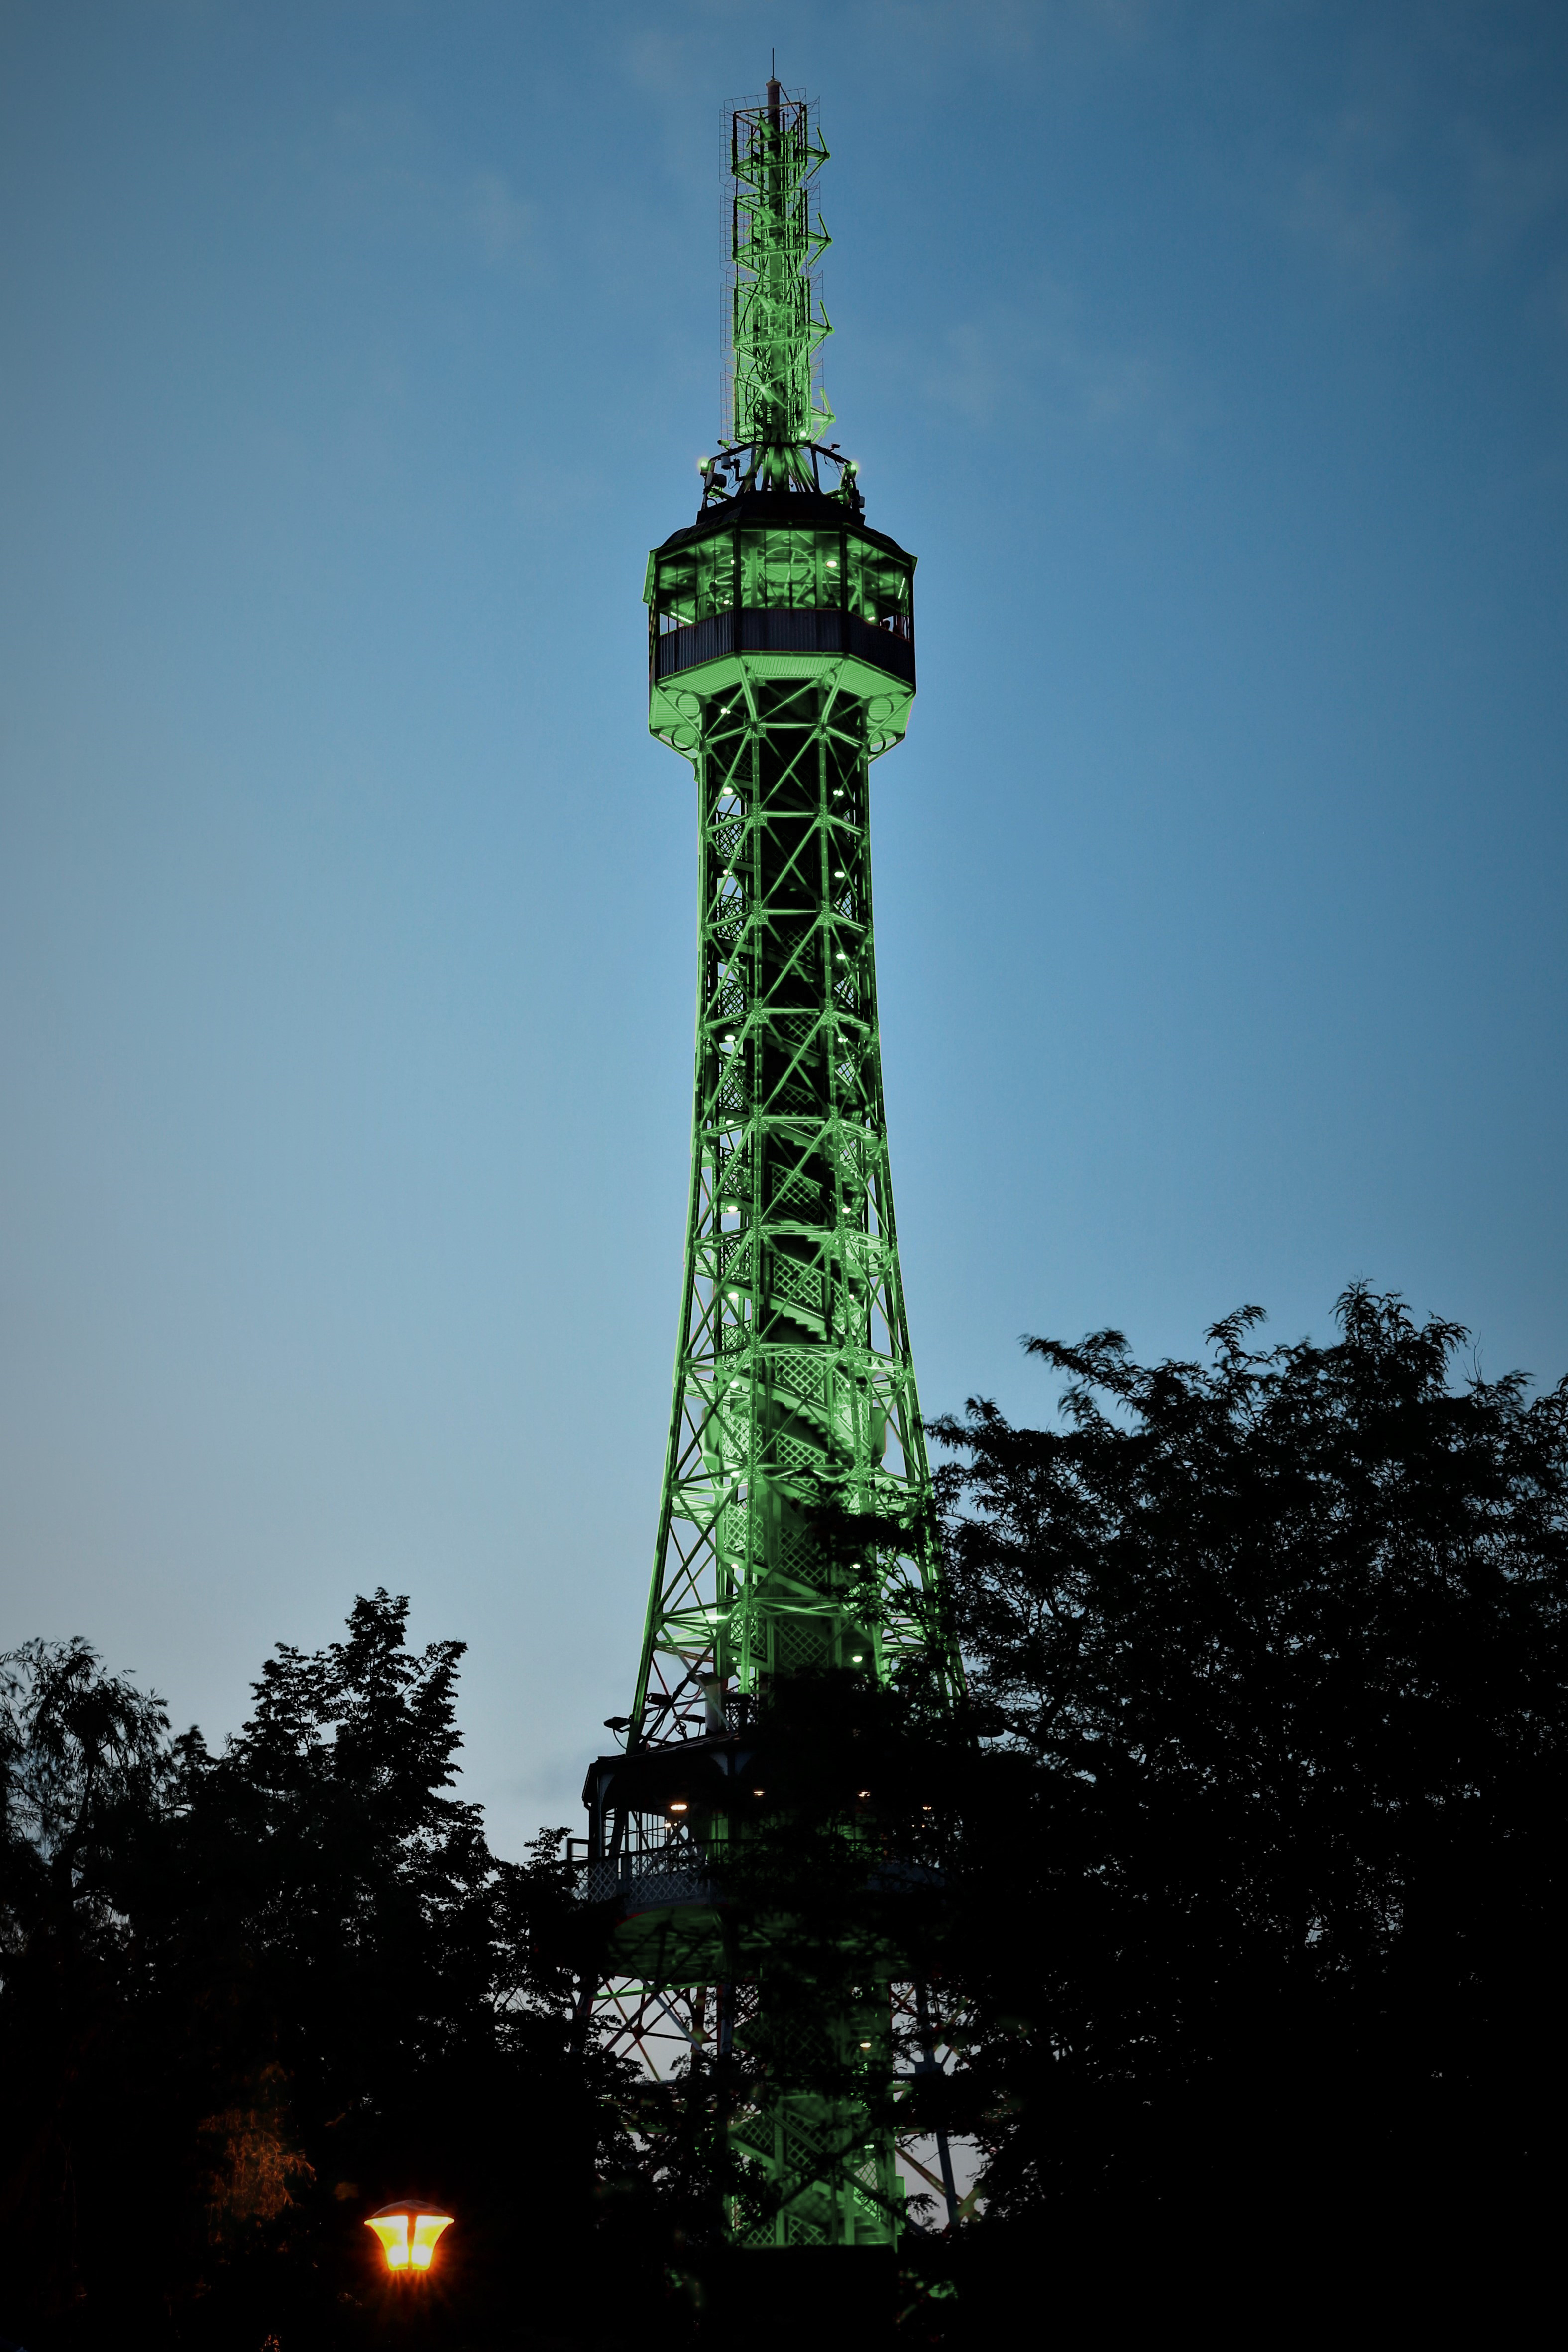 petrinska-rozhledna-se-17-brezna-oblekne-do-zelene